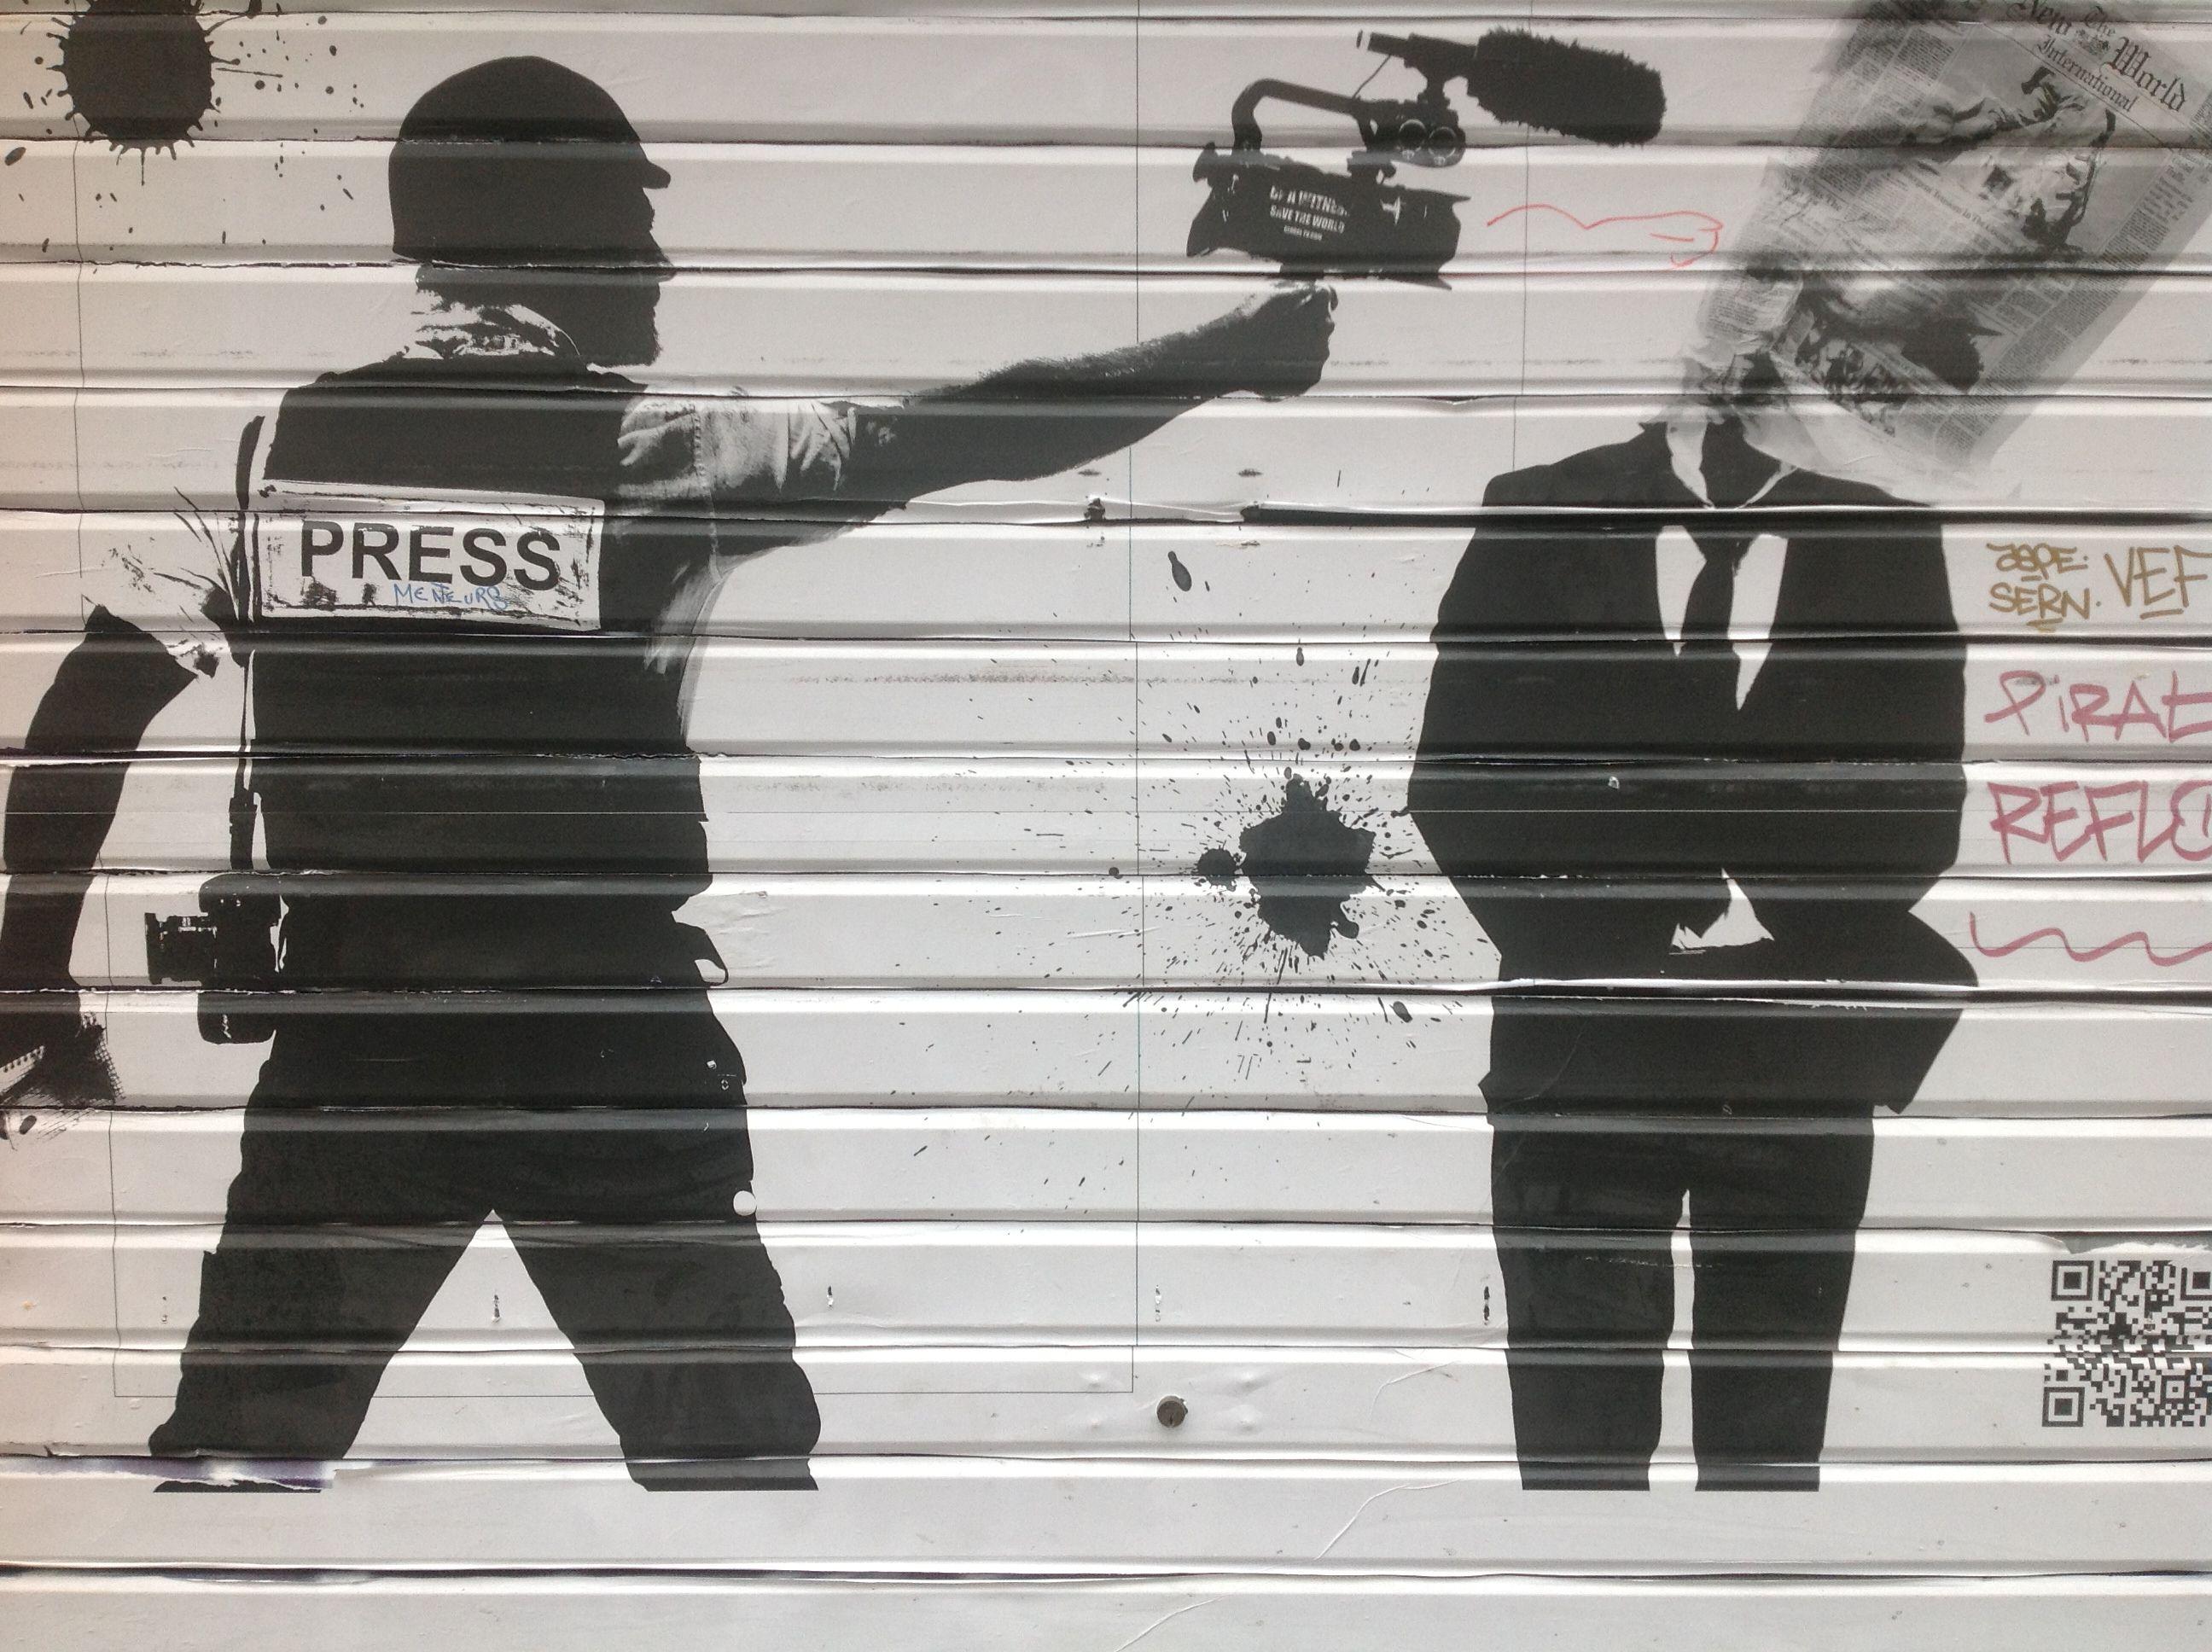 I hope its a banksy street art i have encountered pinterest